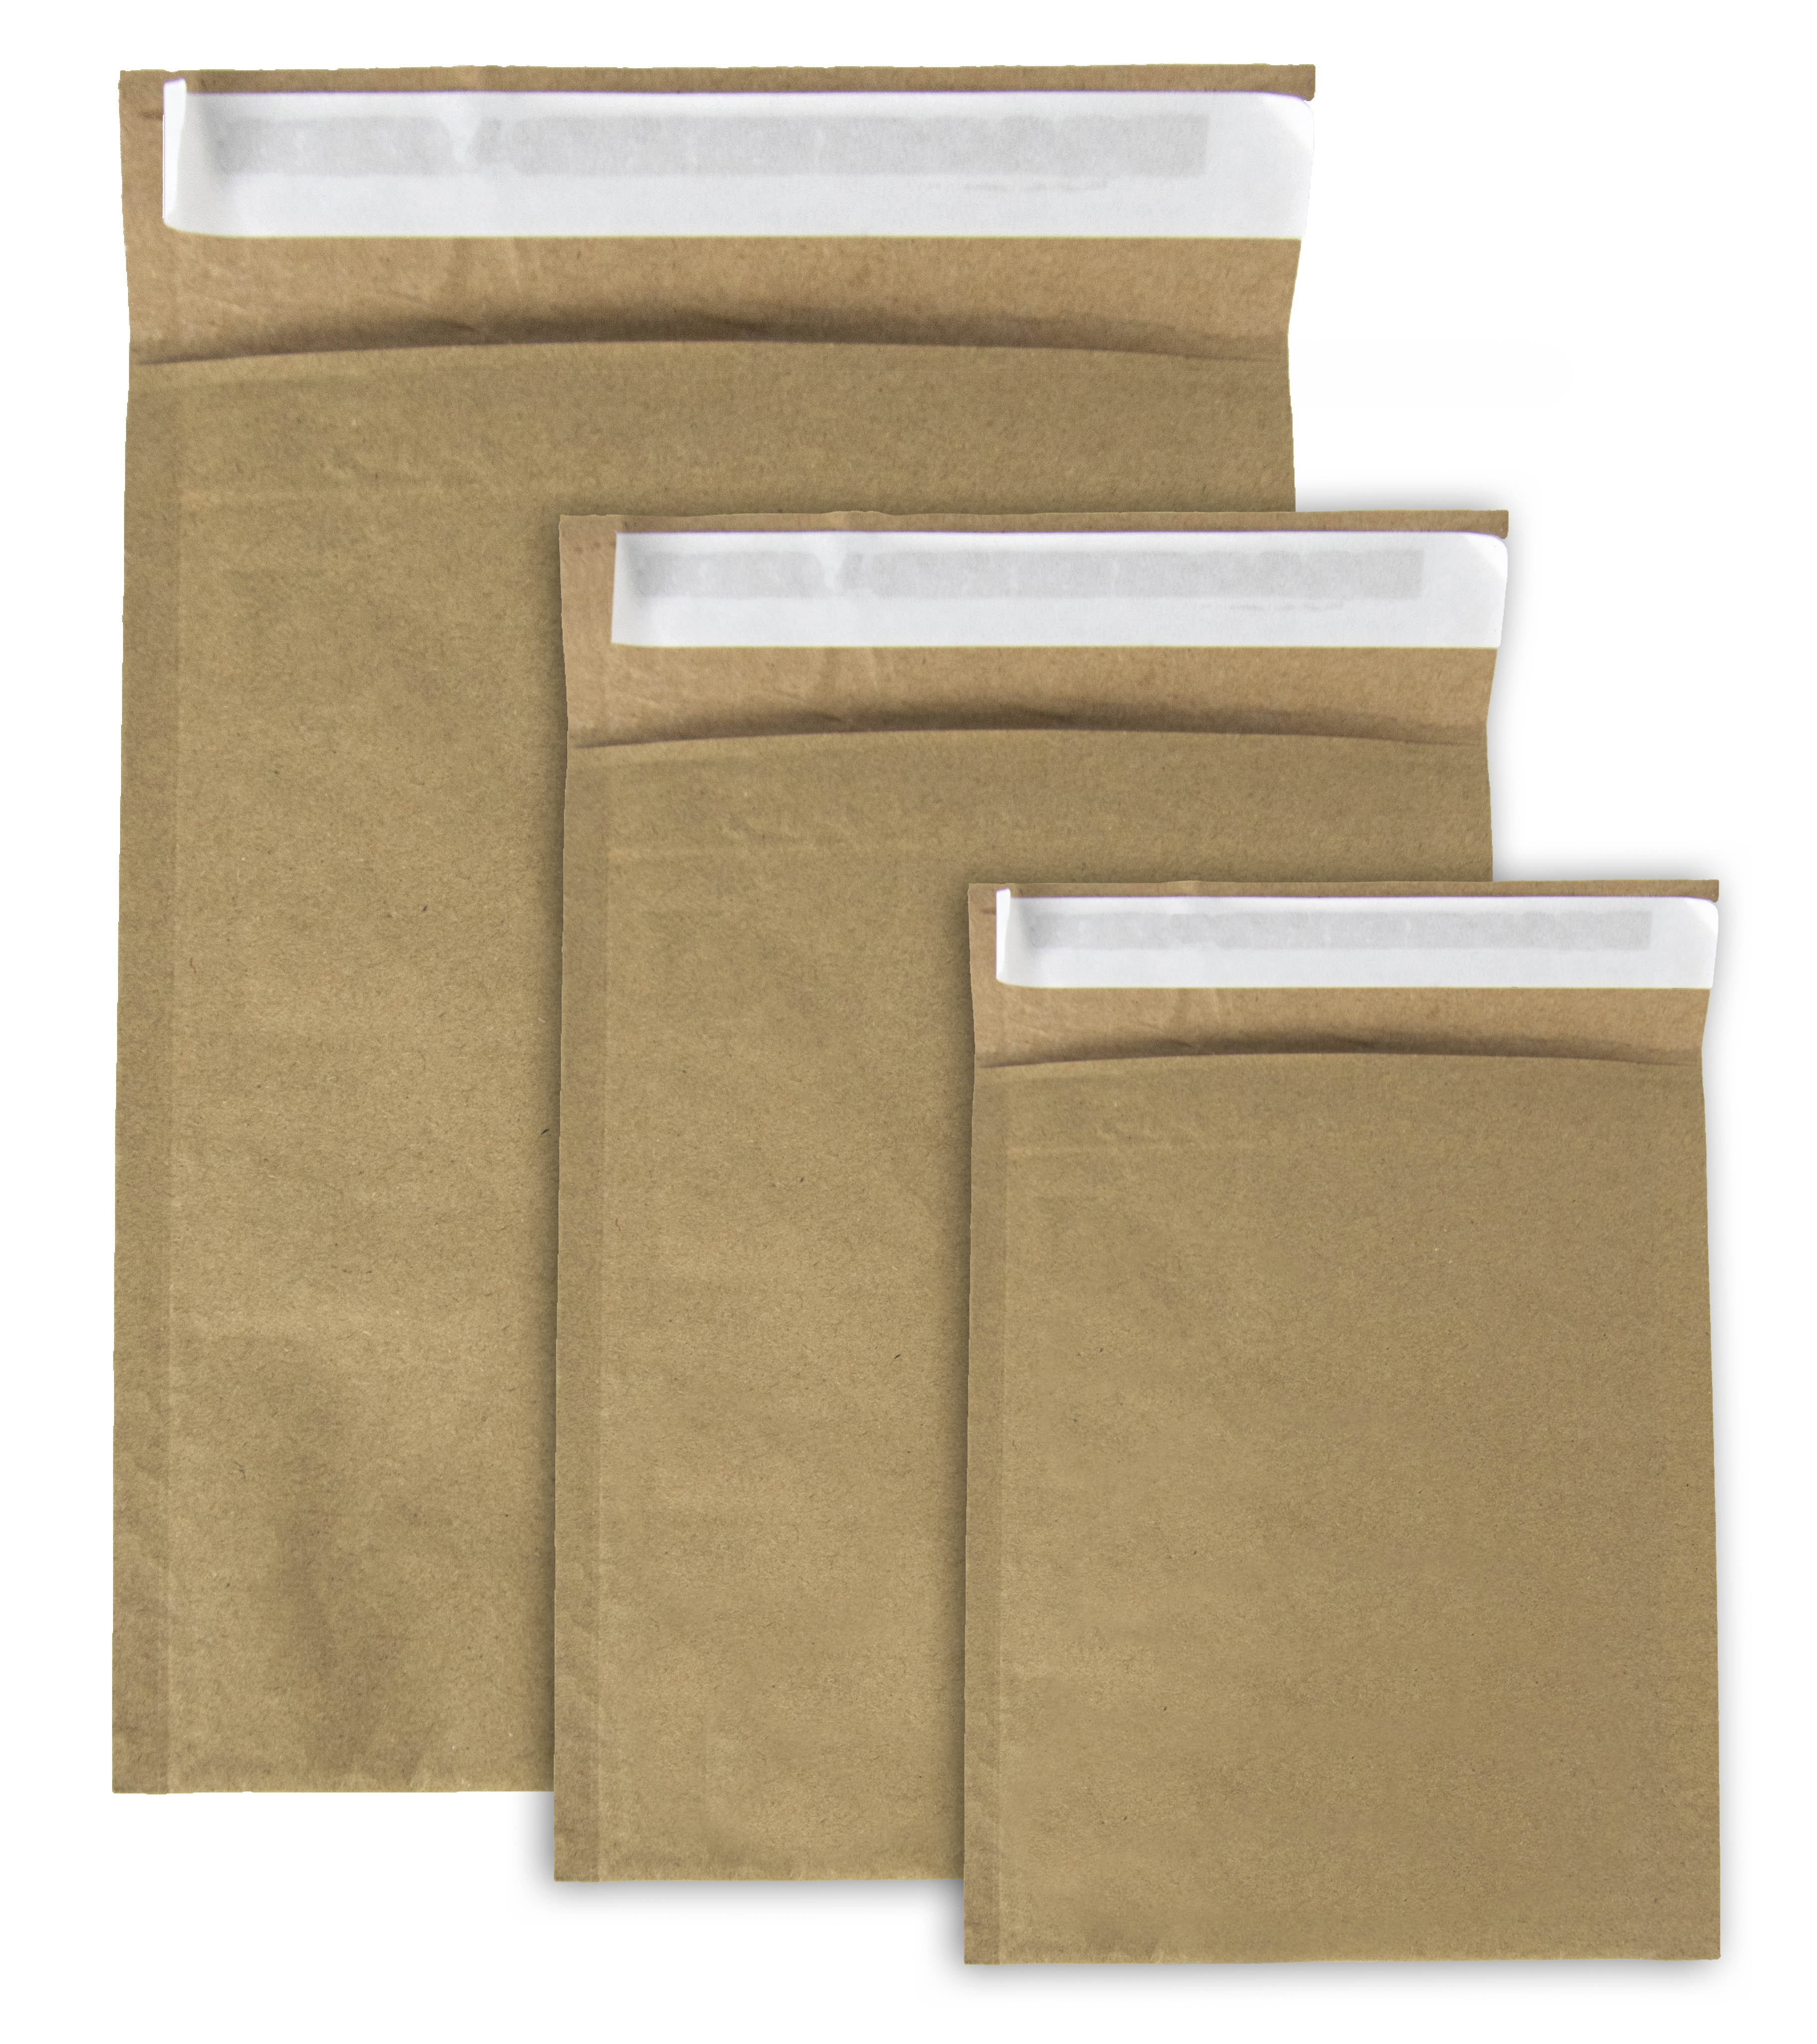 Kategorie Papierversandtaschen